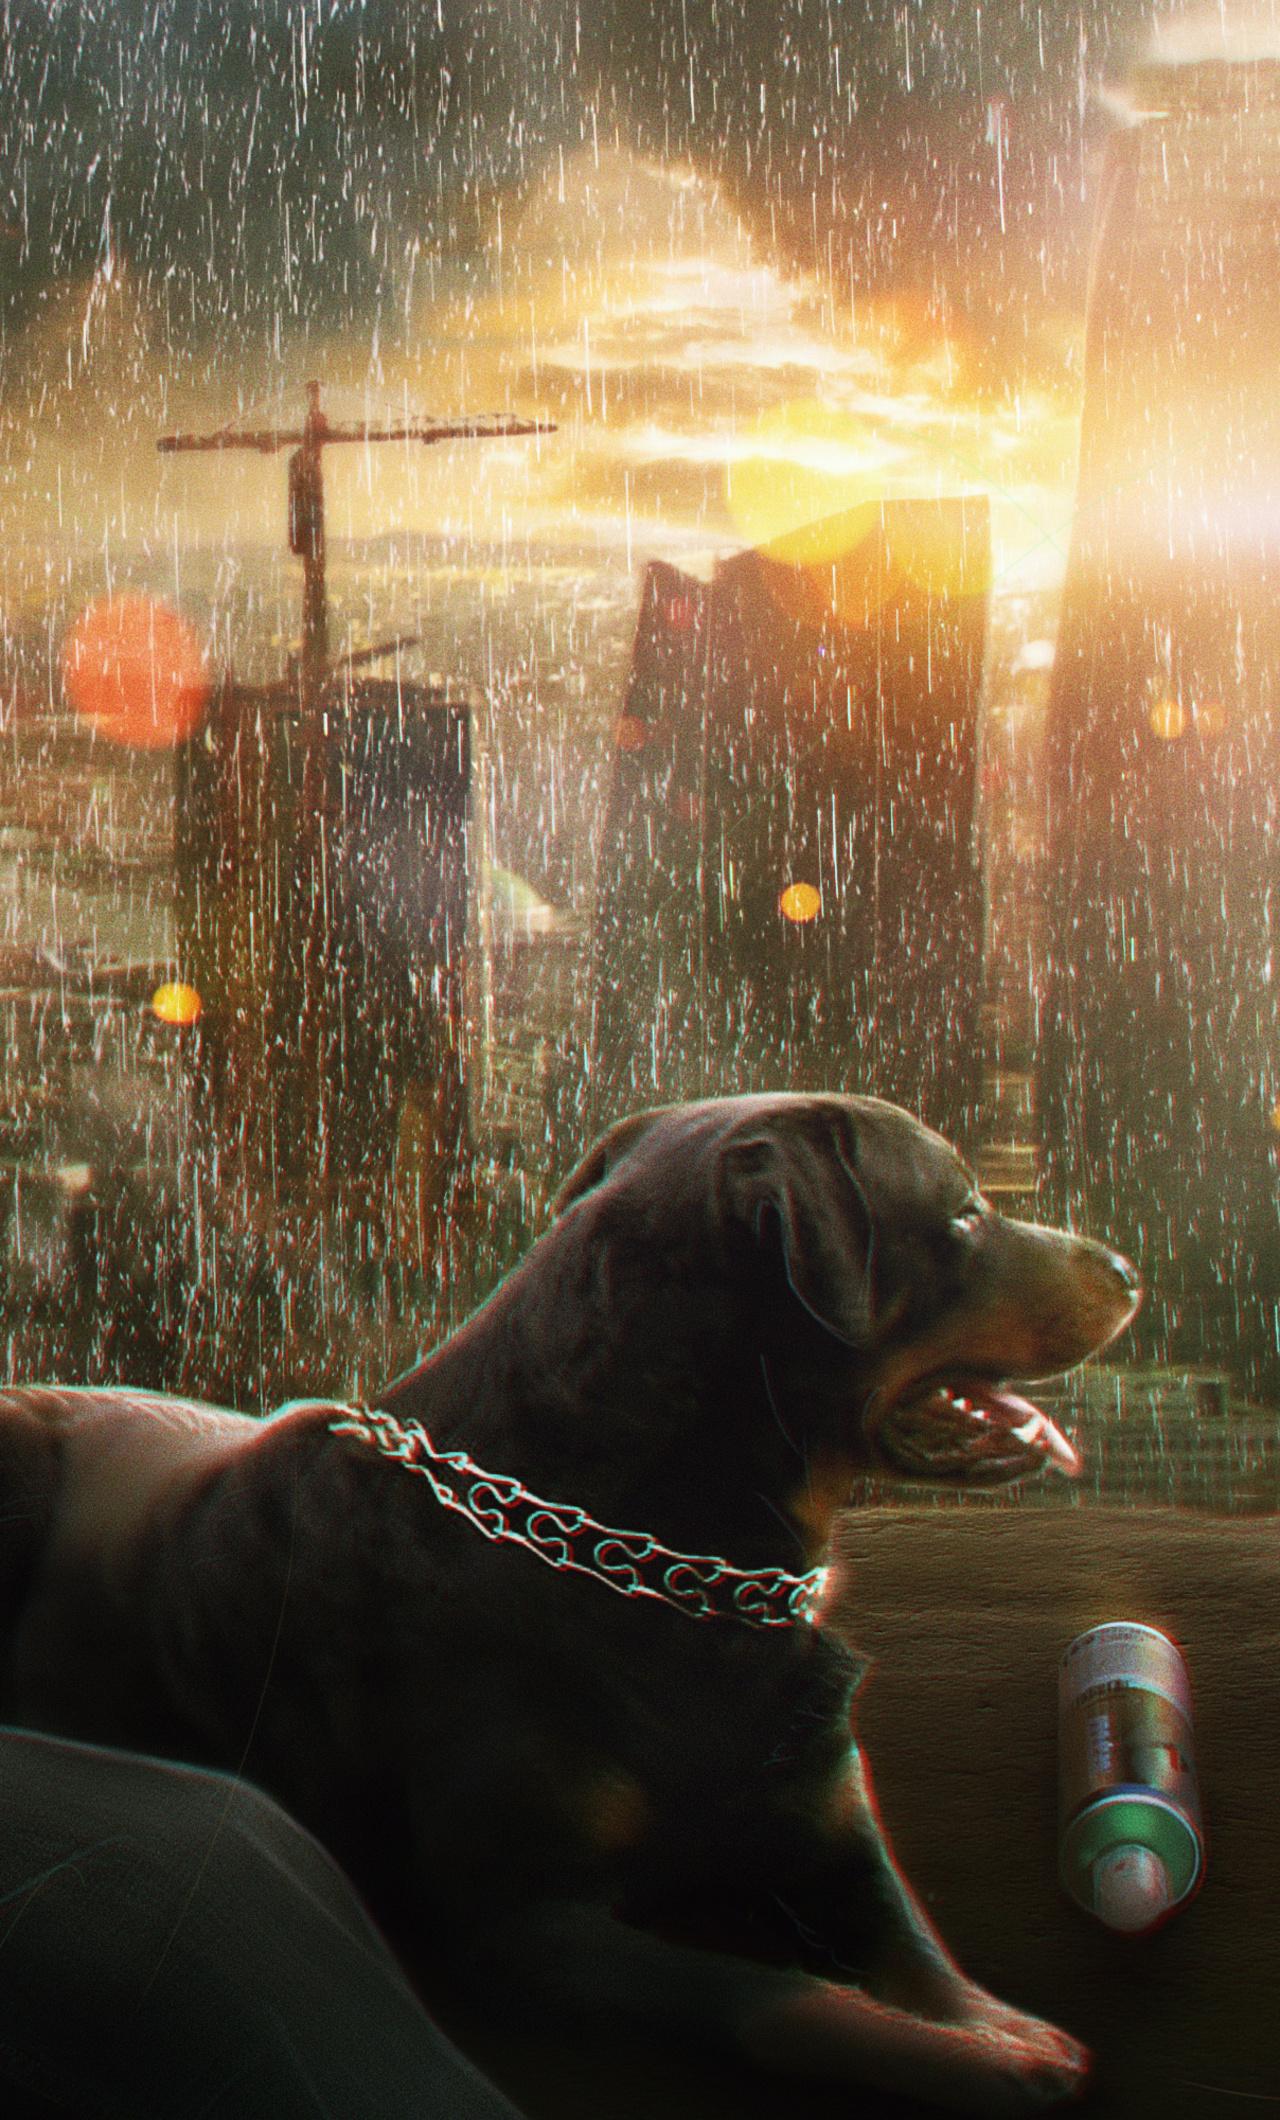 rainy-mood-dog-boy-photo-manipulation-sk.jpg